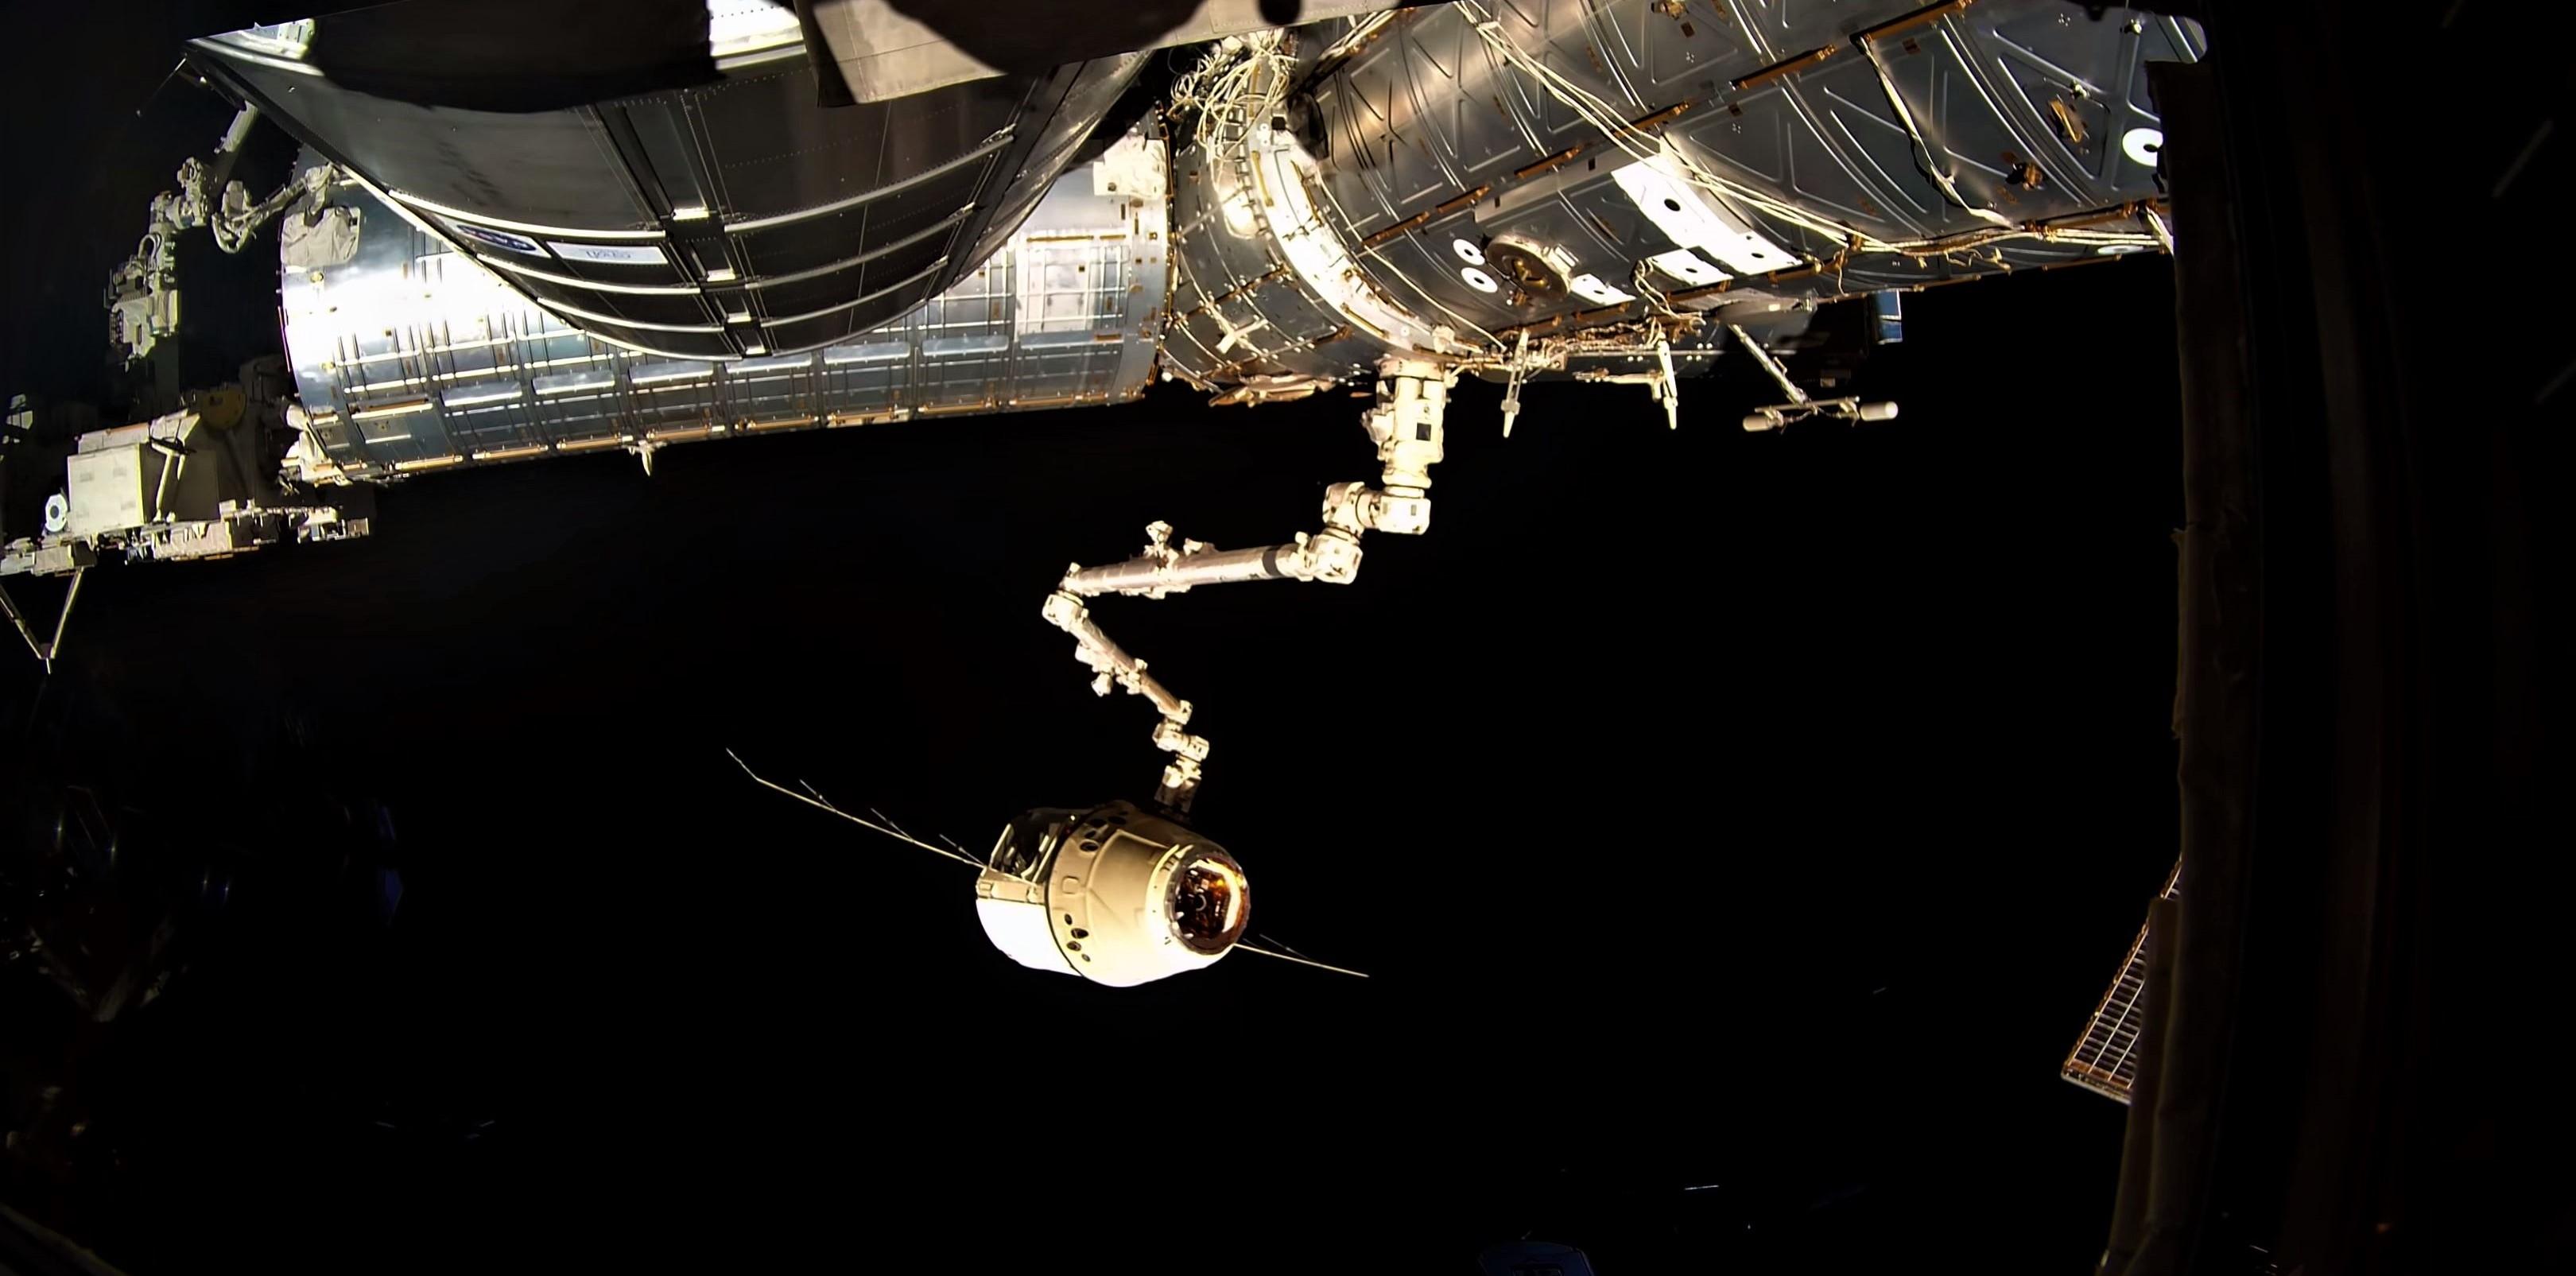 CRS-15 departure 4K (ESA) 5